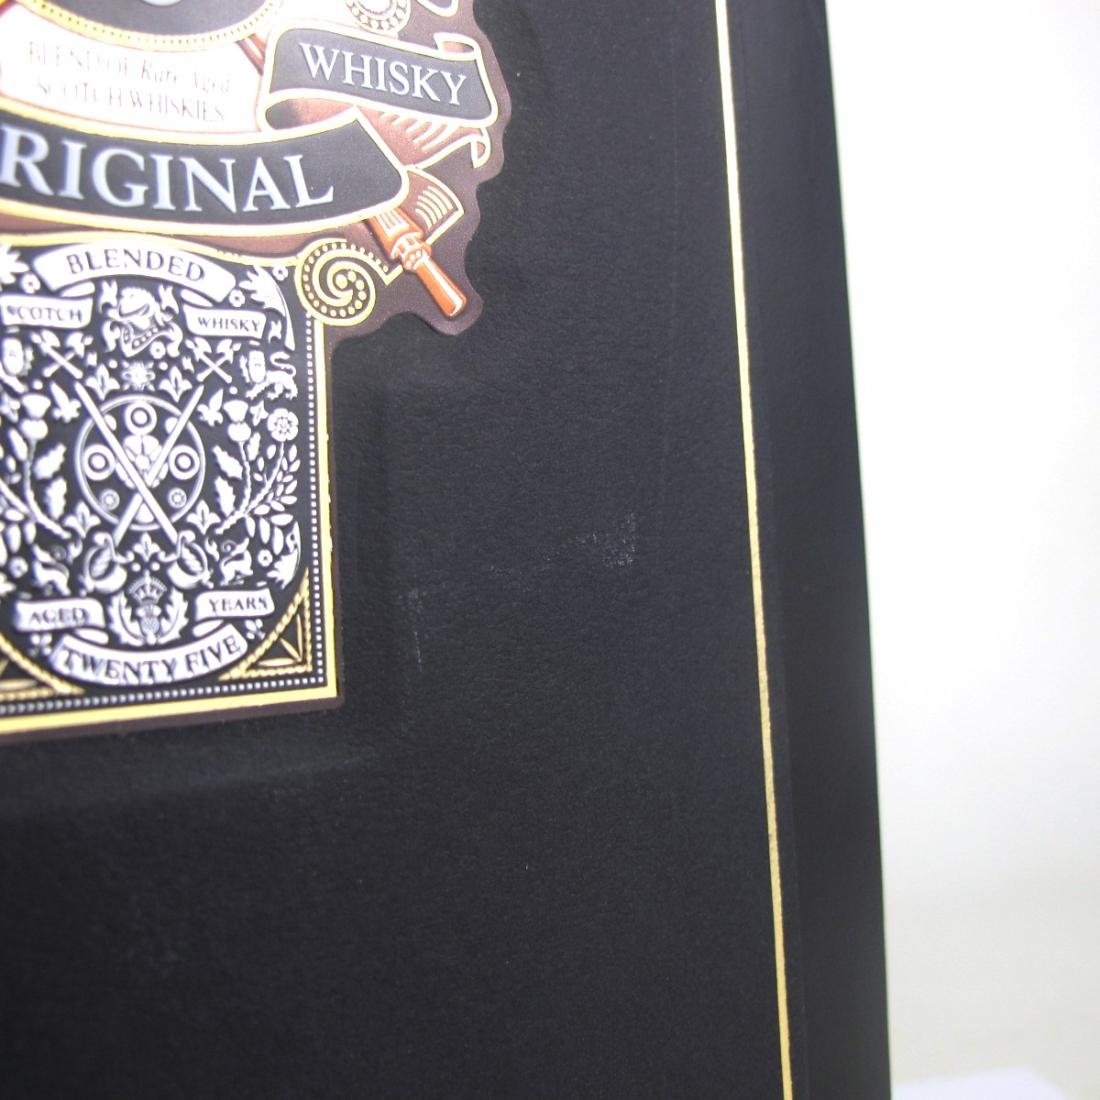 Chivas Regal 25 Year Old 75cl / US Import